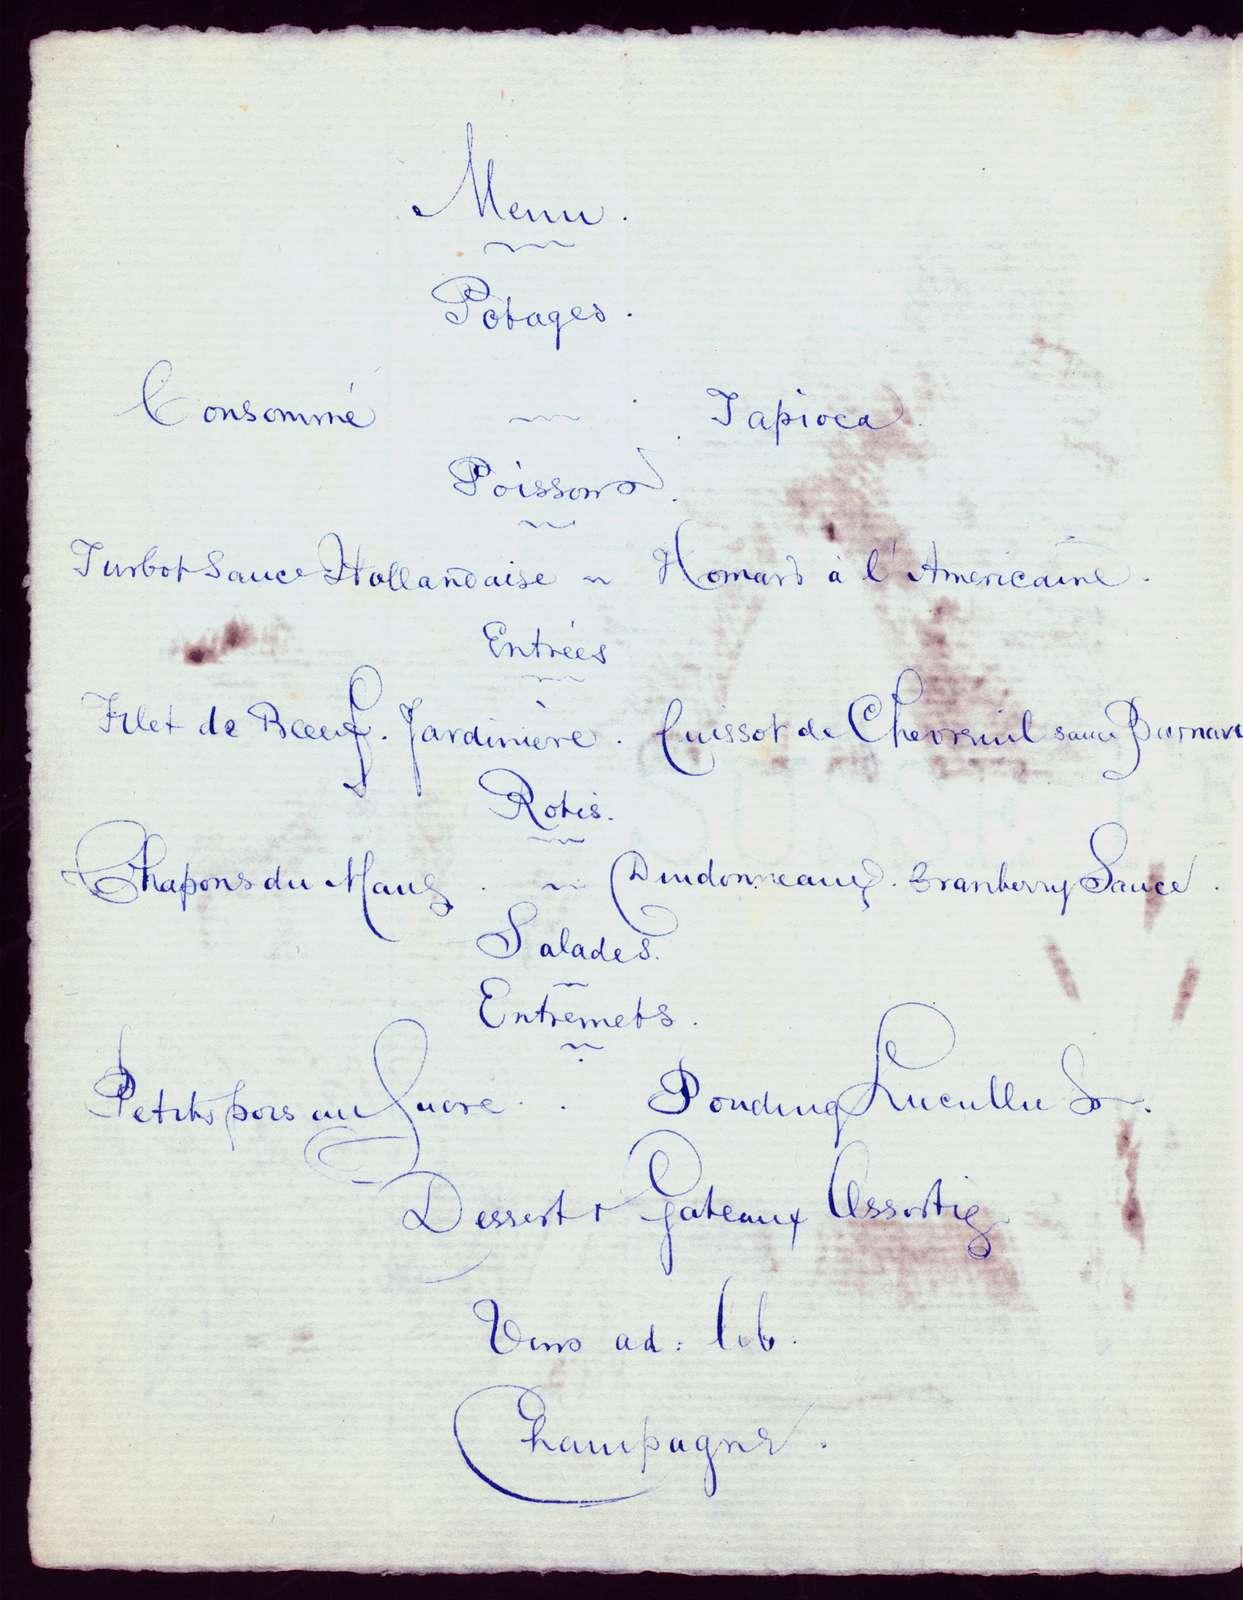 THANKSGIVING DAY MENU & PROGRAM [held by] HOTEL DE DIJON [at] [?FRANCE?] (HOT;)